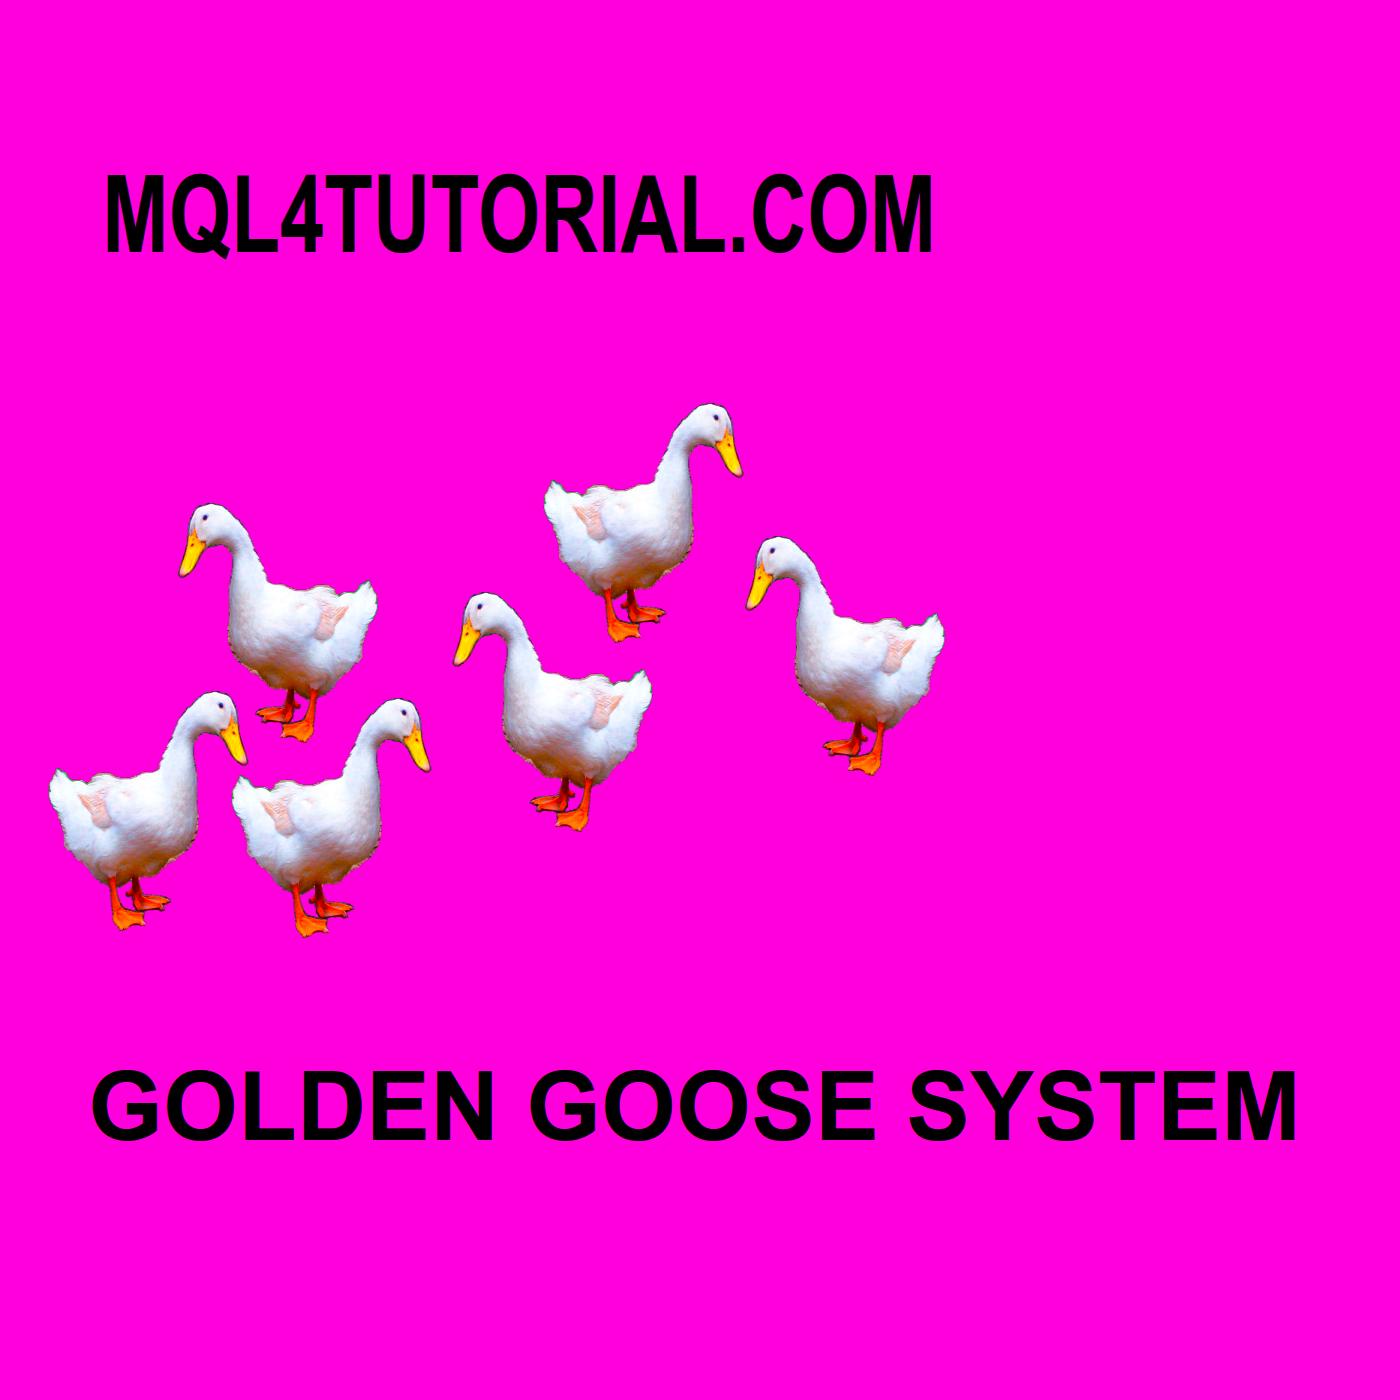 MQL4TUTORIAL.COM